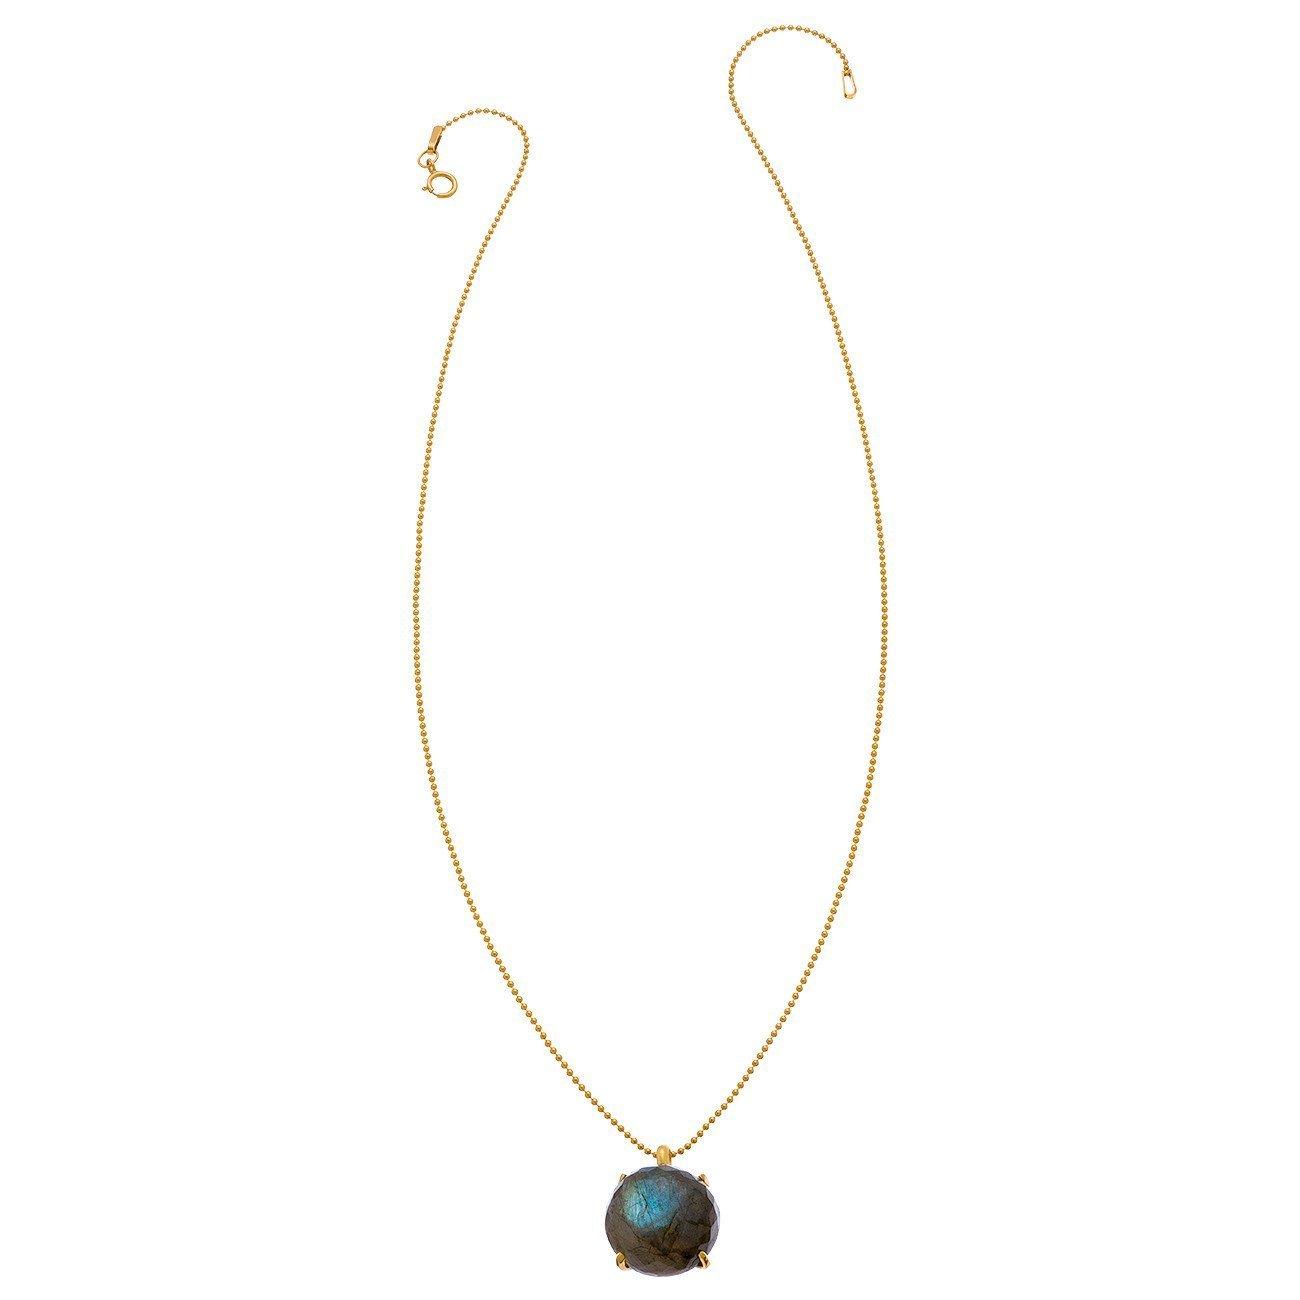 Heather Hawkins - Radiate 15mm Necklace